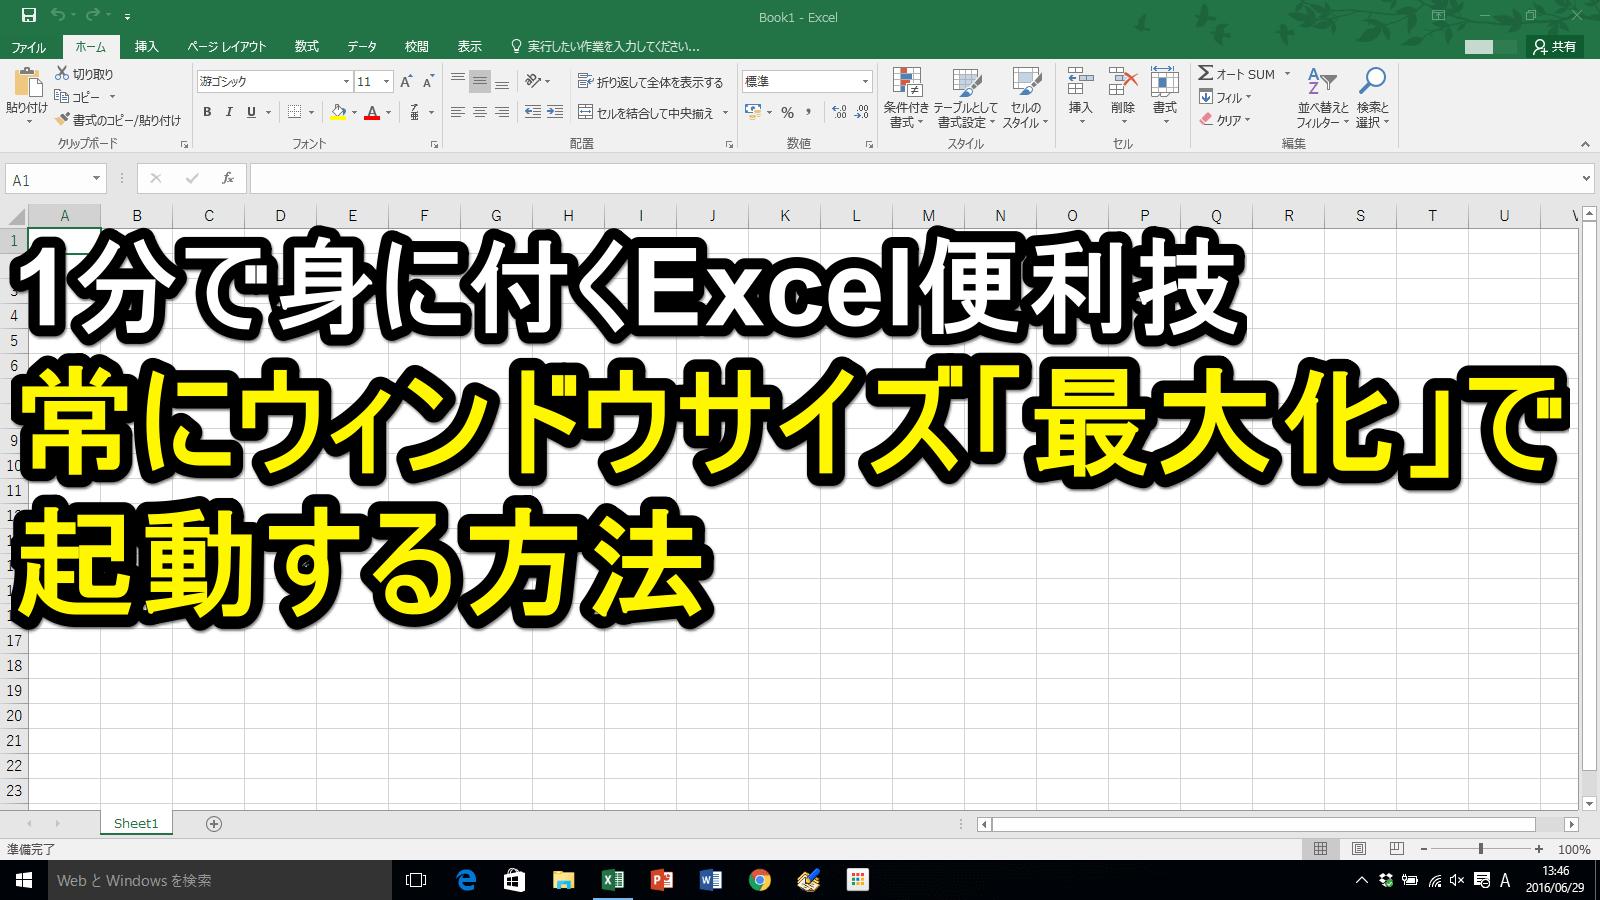 【Excel便利技】常にウィンドウサイズ「最大化」で起動する方法